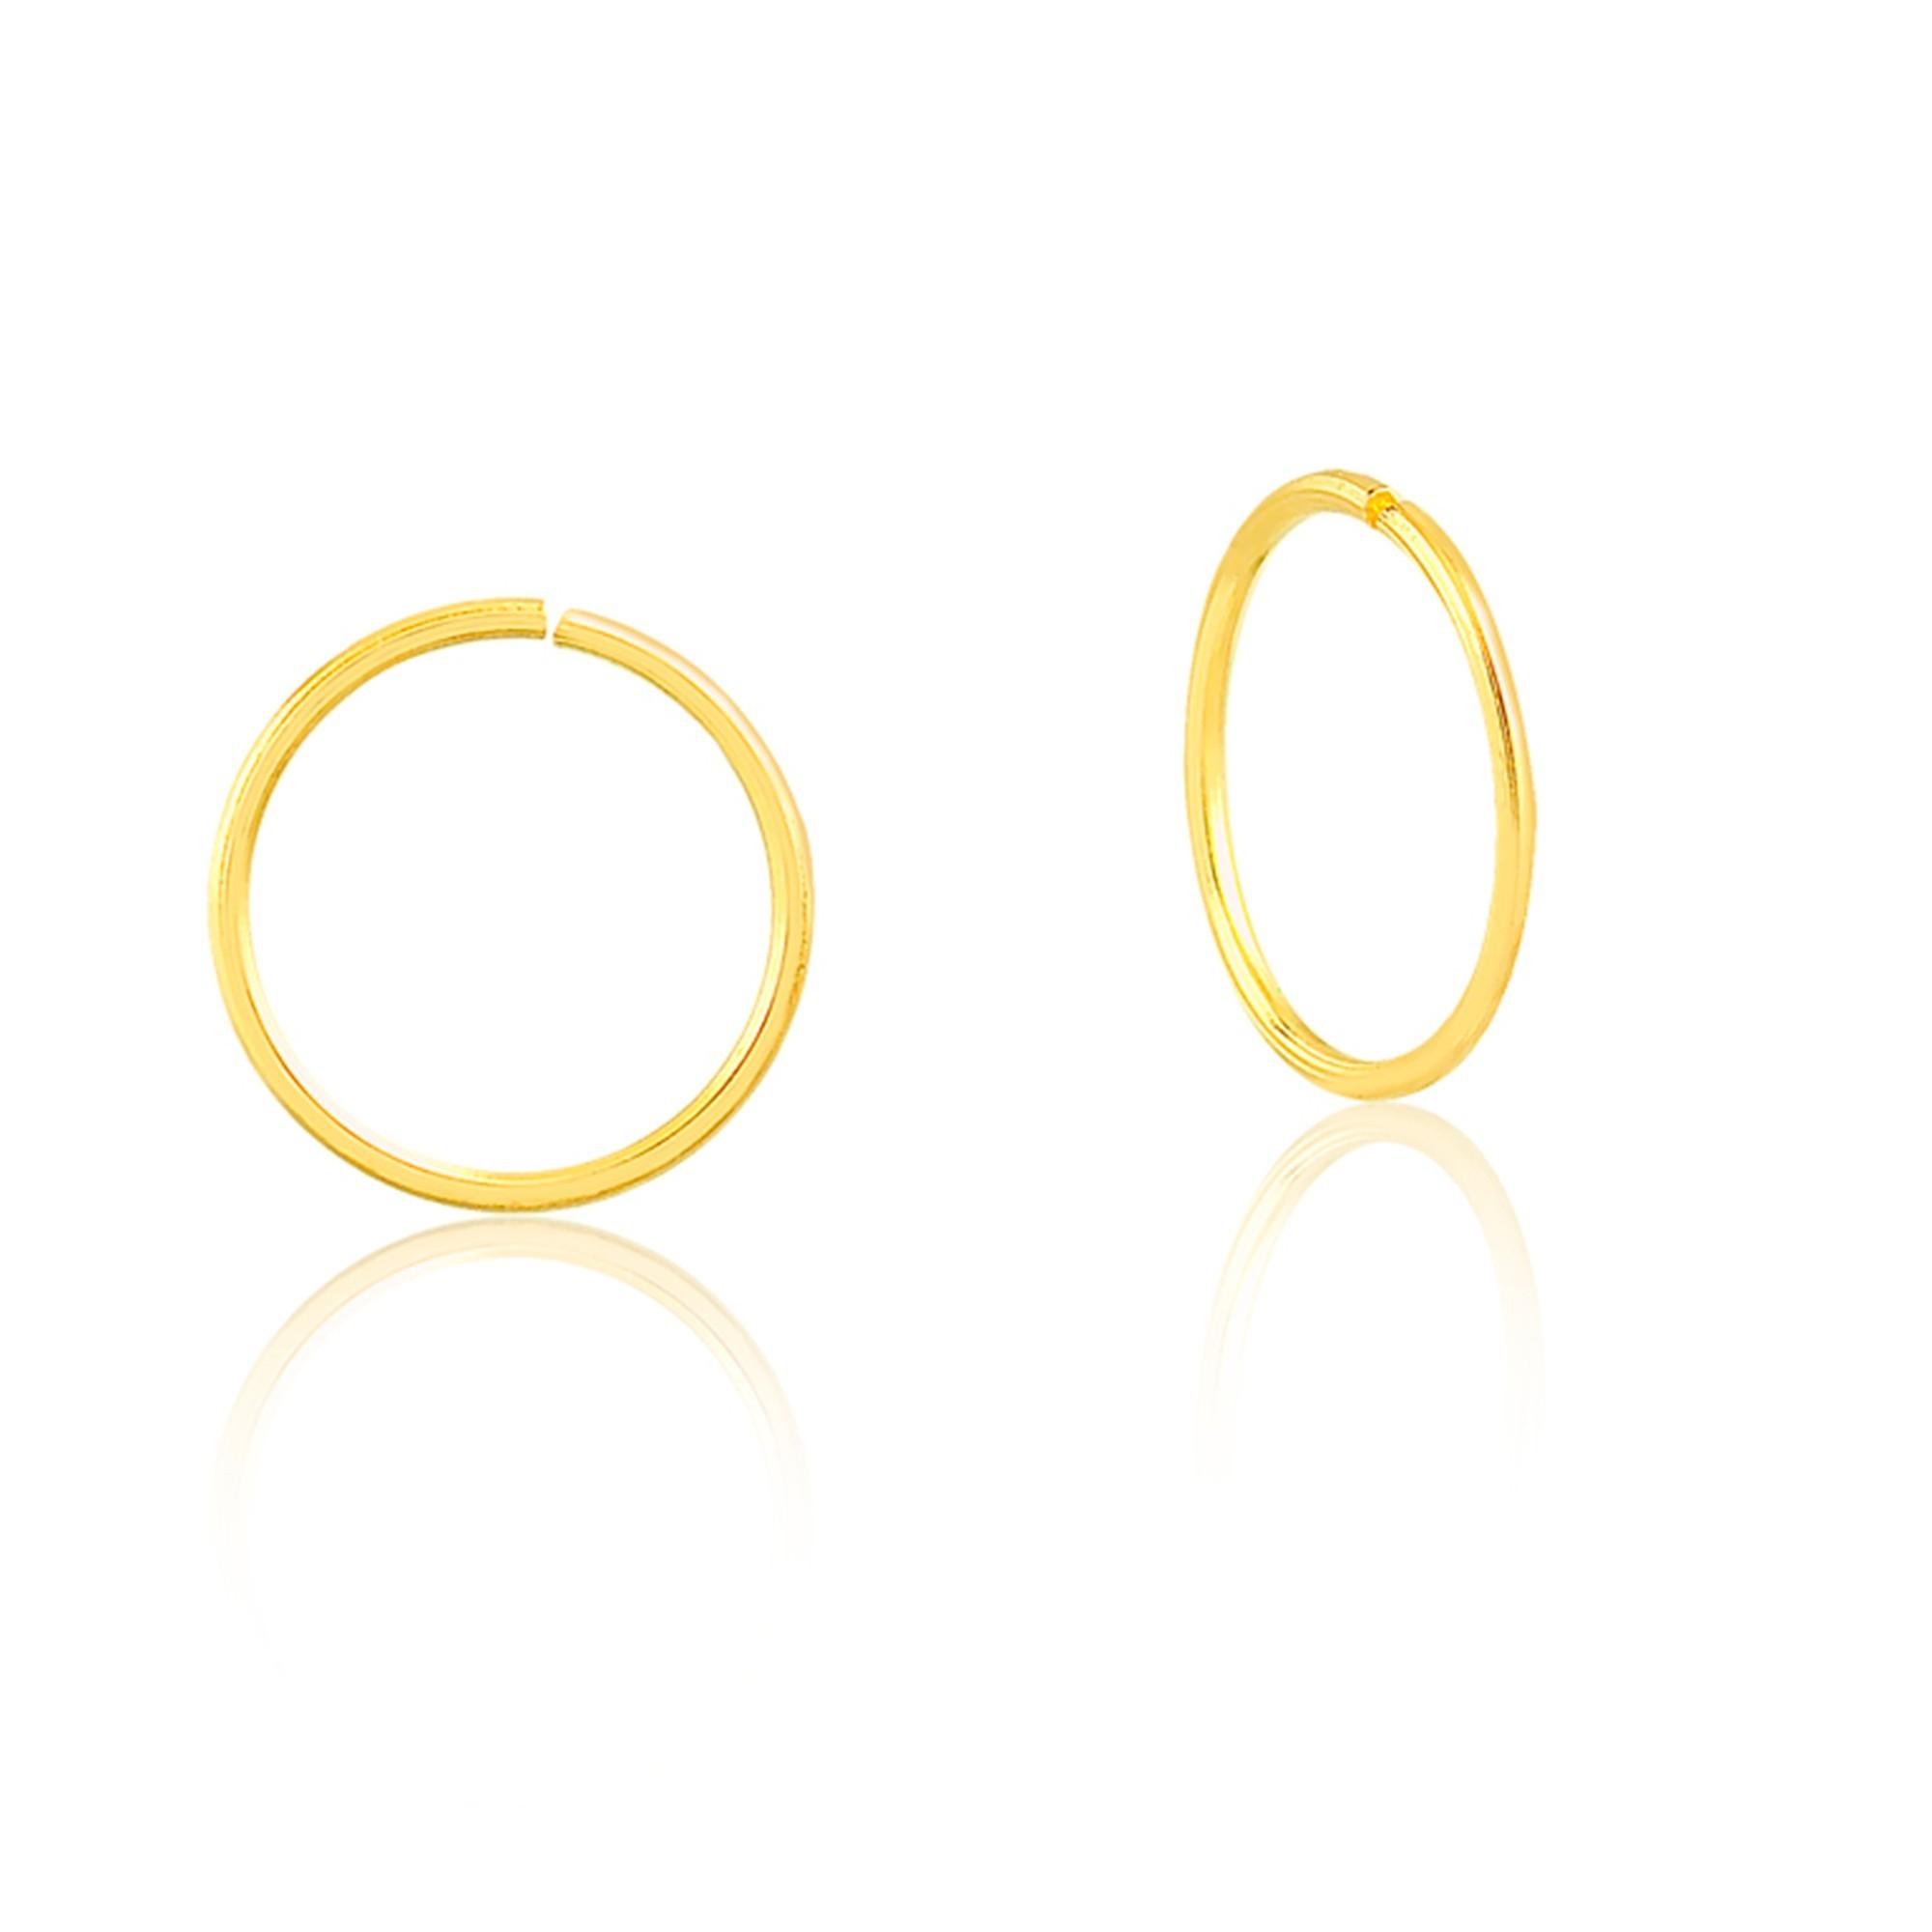 Piercing de Ouro Feminino Argola Básica 7,5 mm Ouro 18k